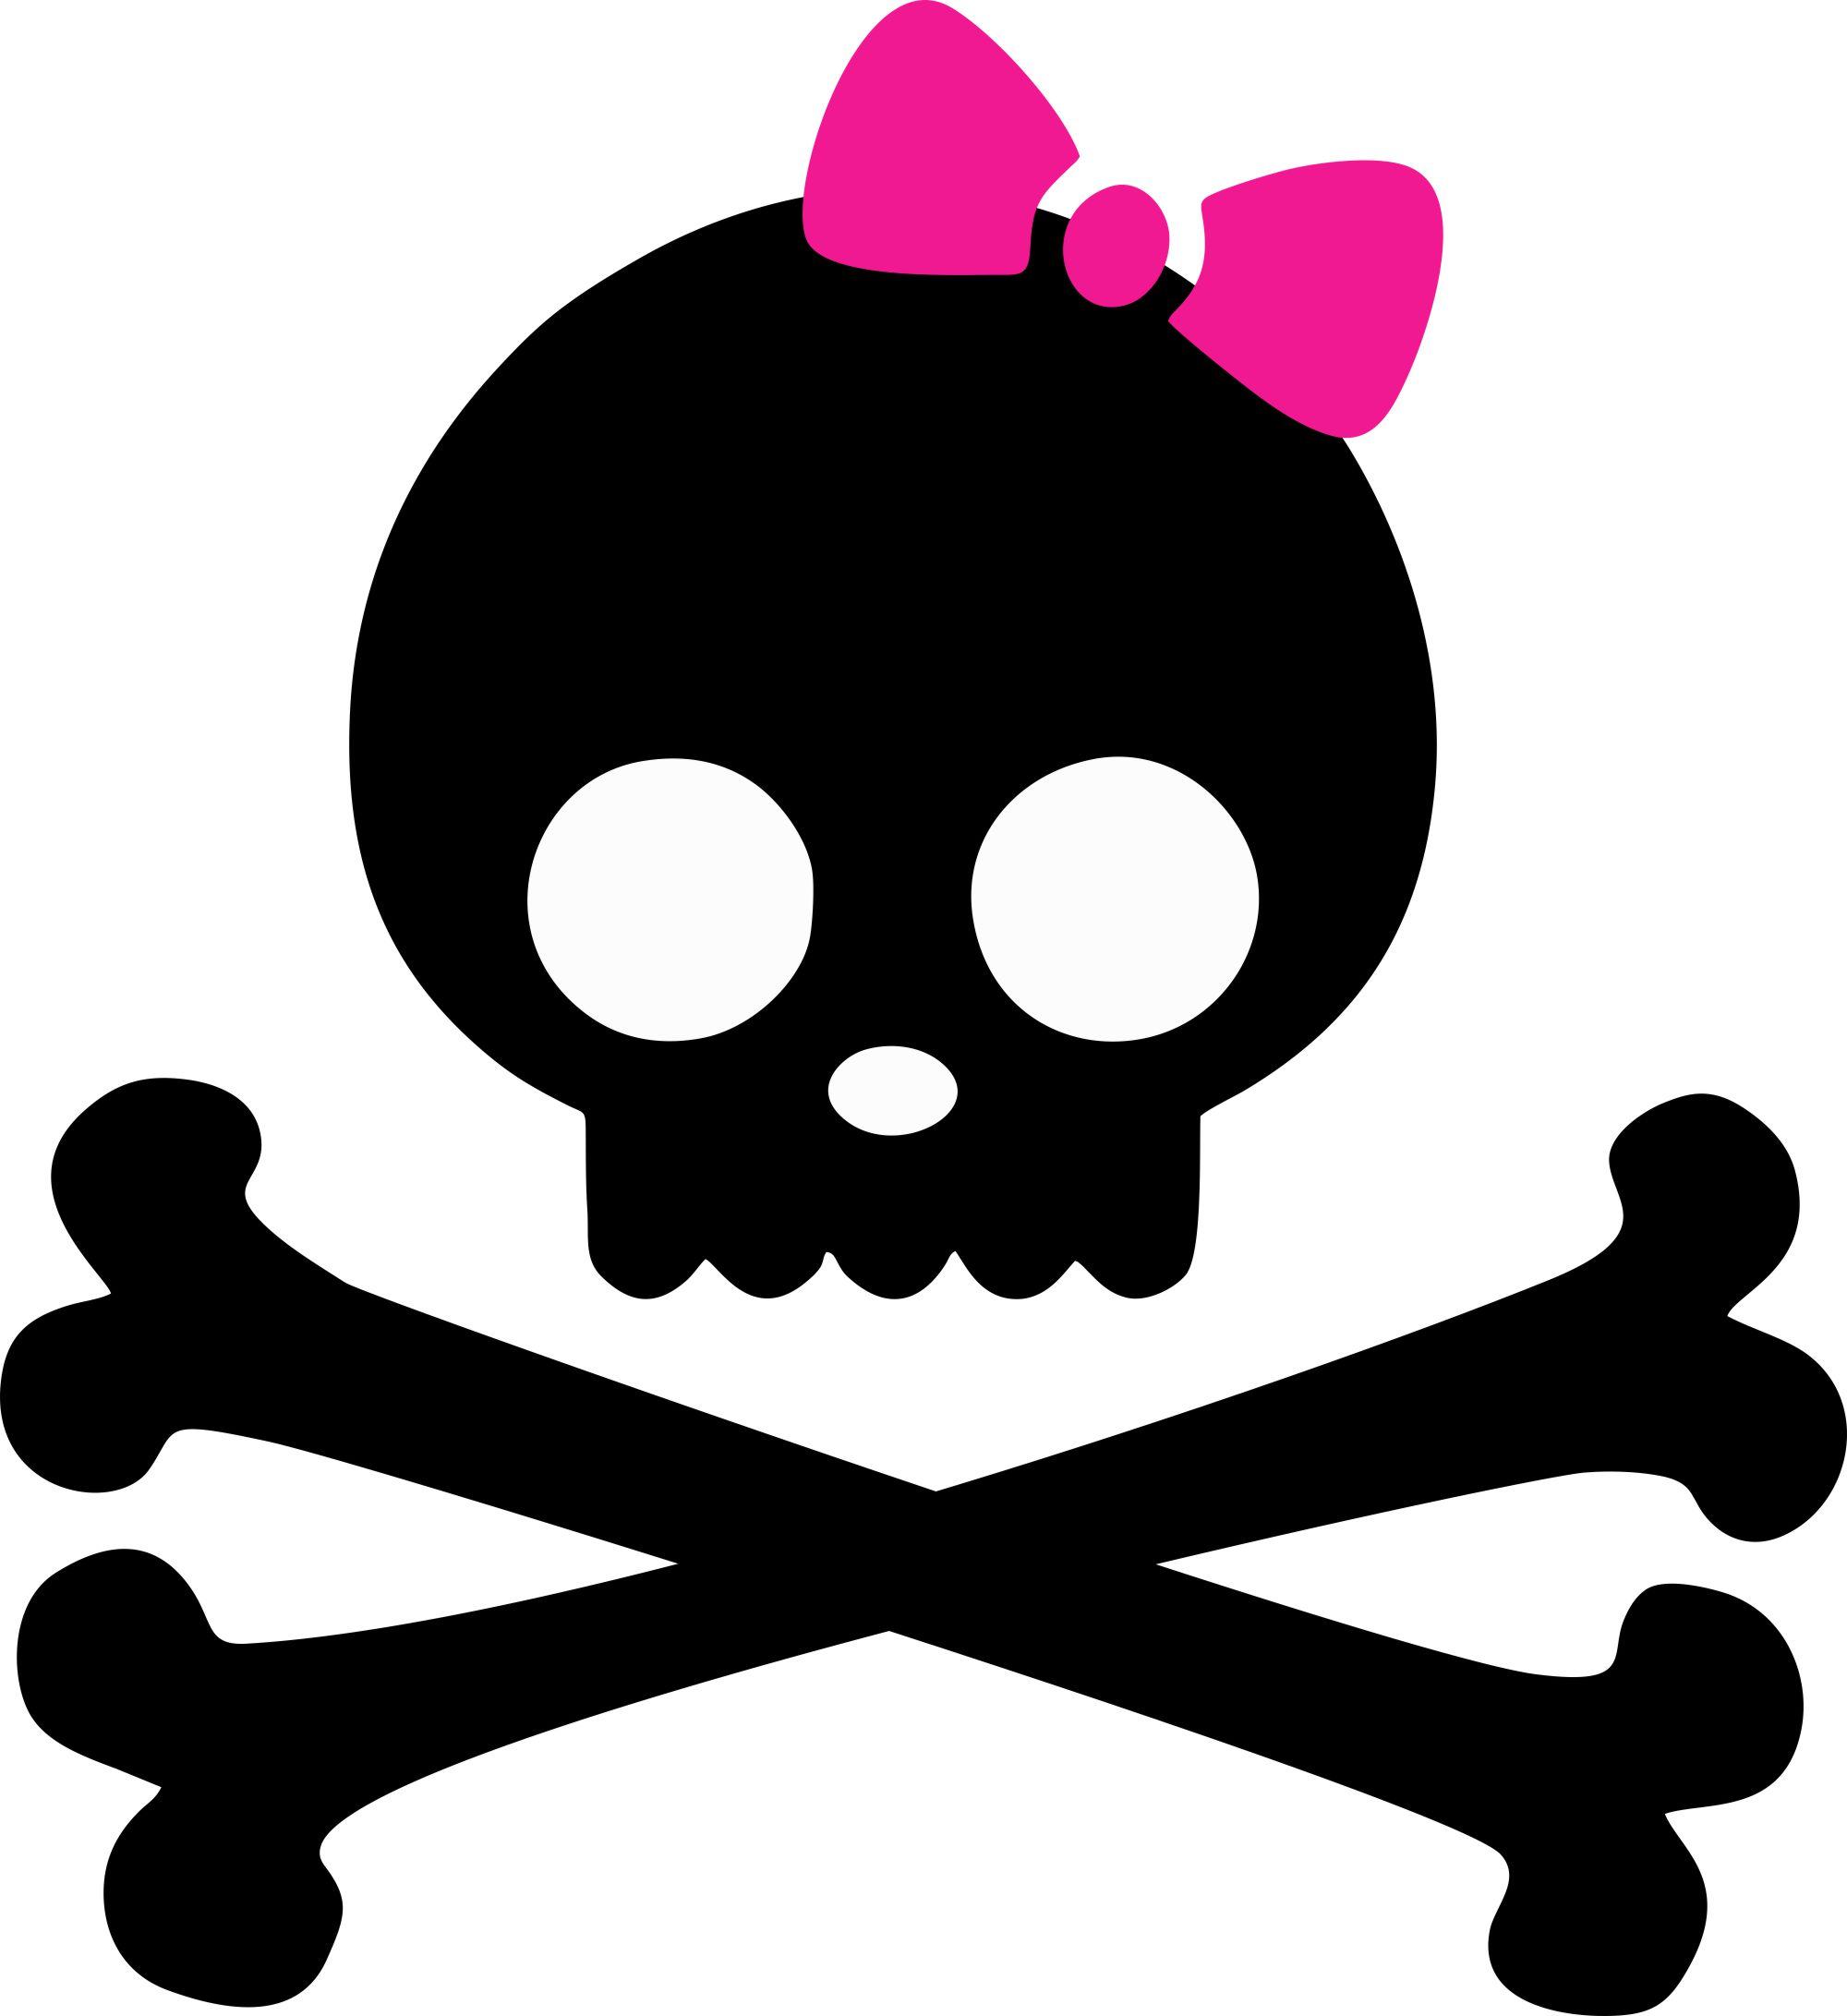 Skull And Crossbones Pink-Skull And Crossbones Pink-11